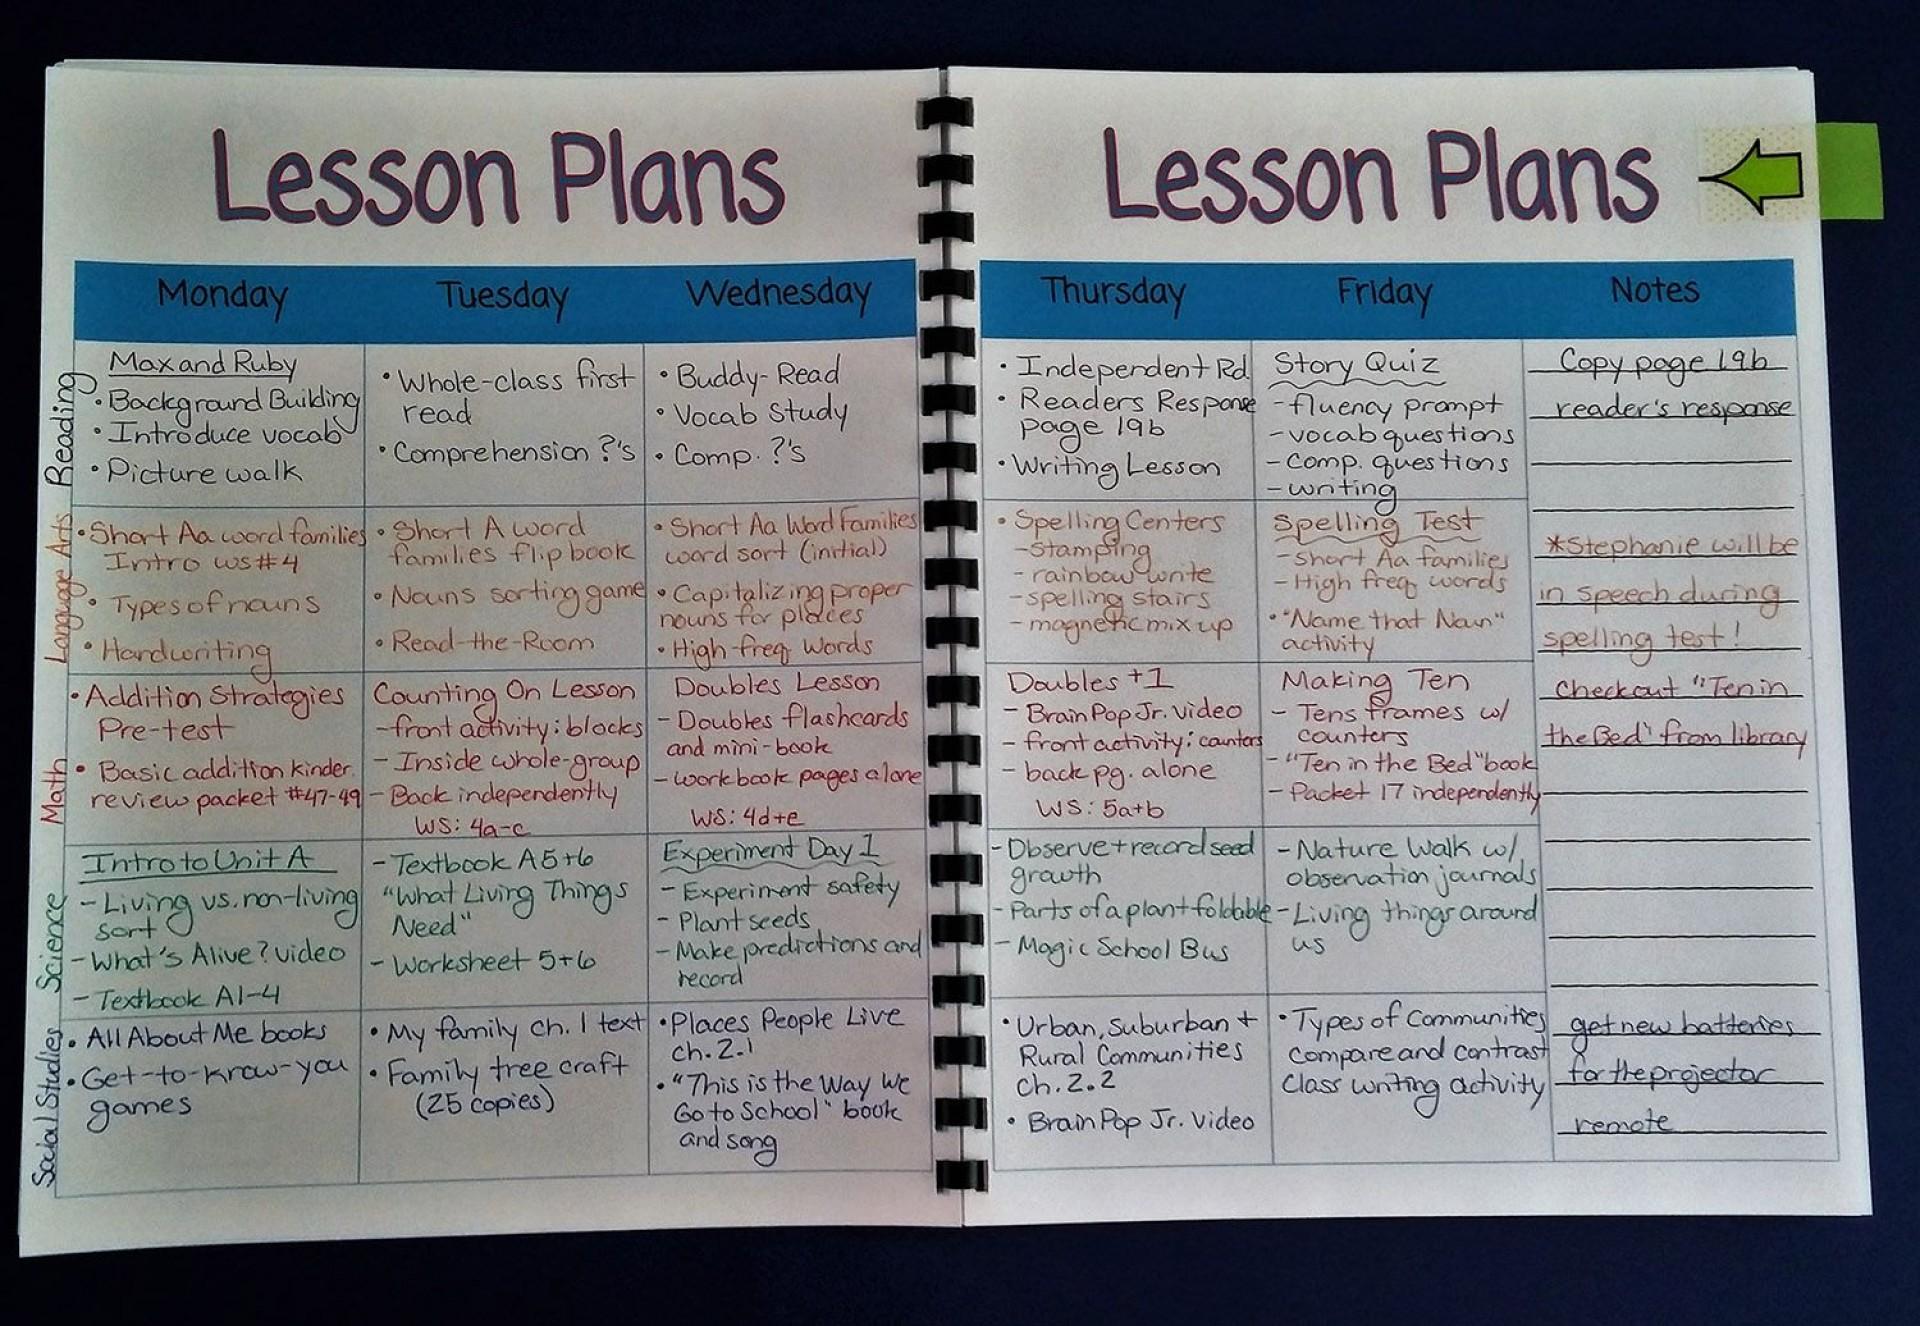 006 Surprising Printable Lesson Plan Template For Teacher Image  Teachers1920